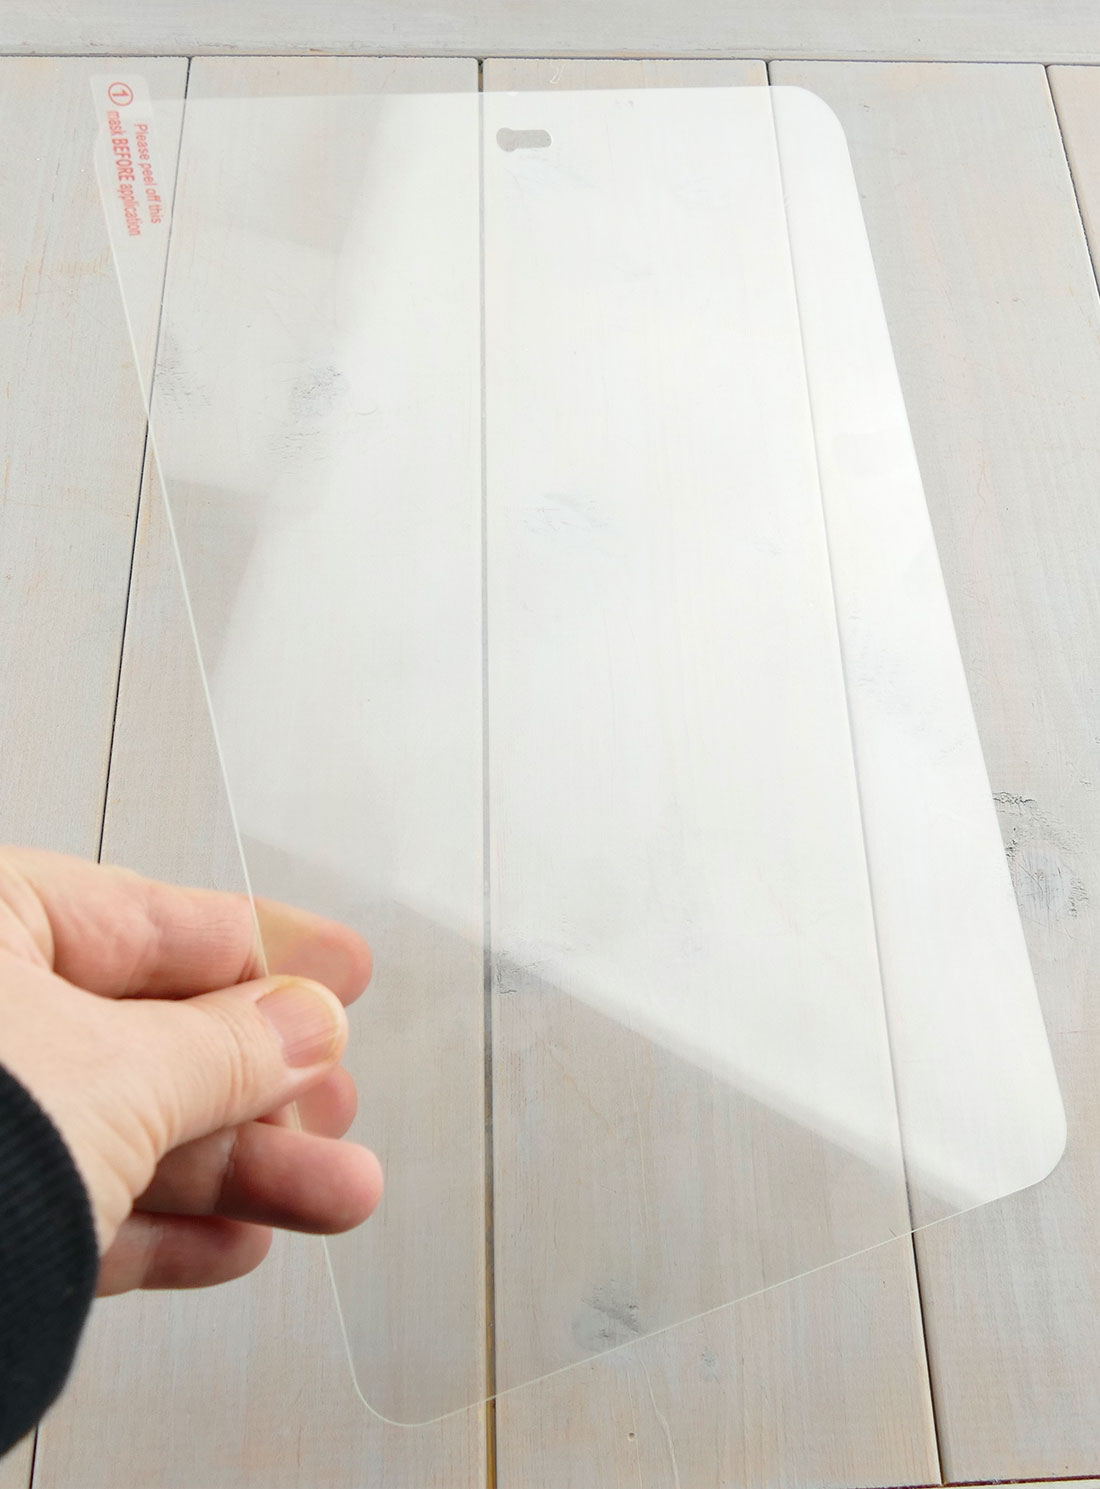 szkło hartowane na tablet Xiaomi MiPAD 3 9.7 cala